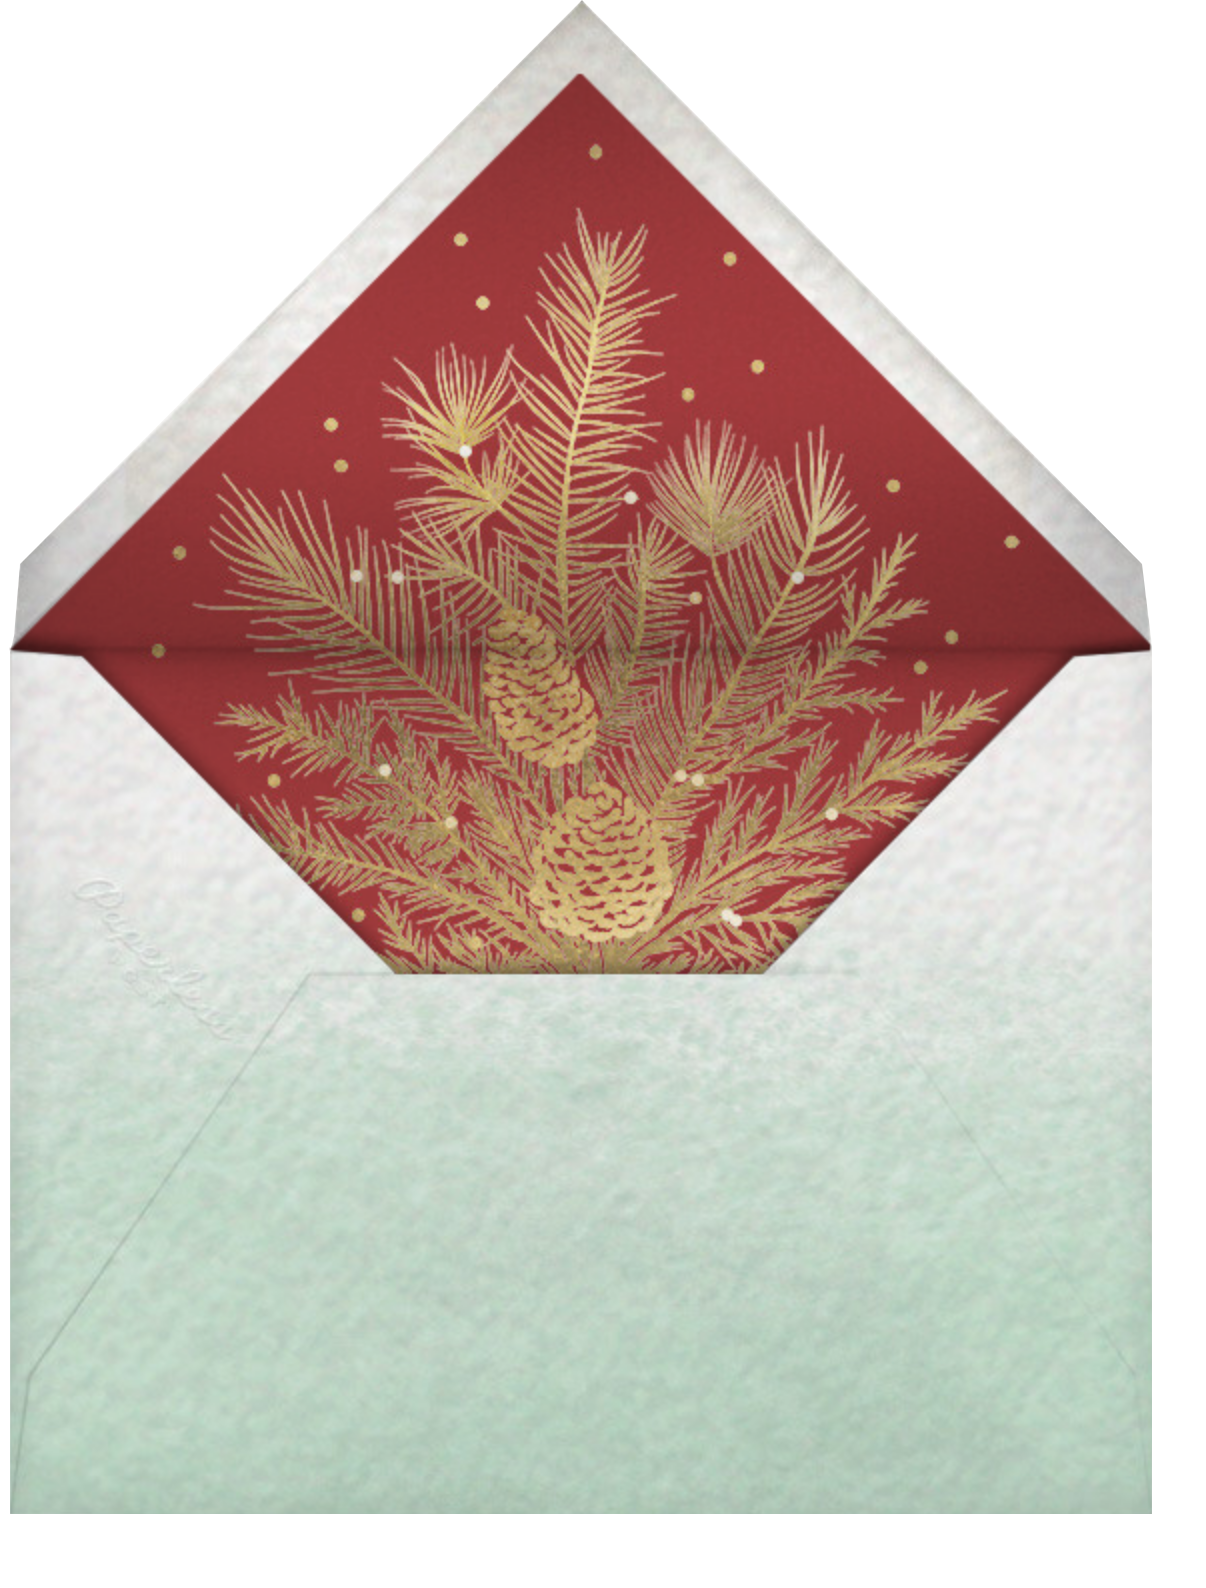 Retro Christmas (Tall) - Paperless Post - Christmas - envelope back